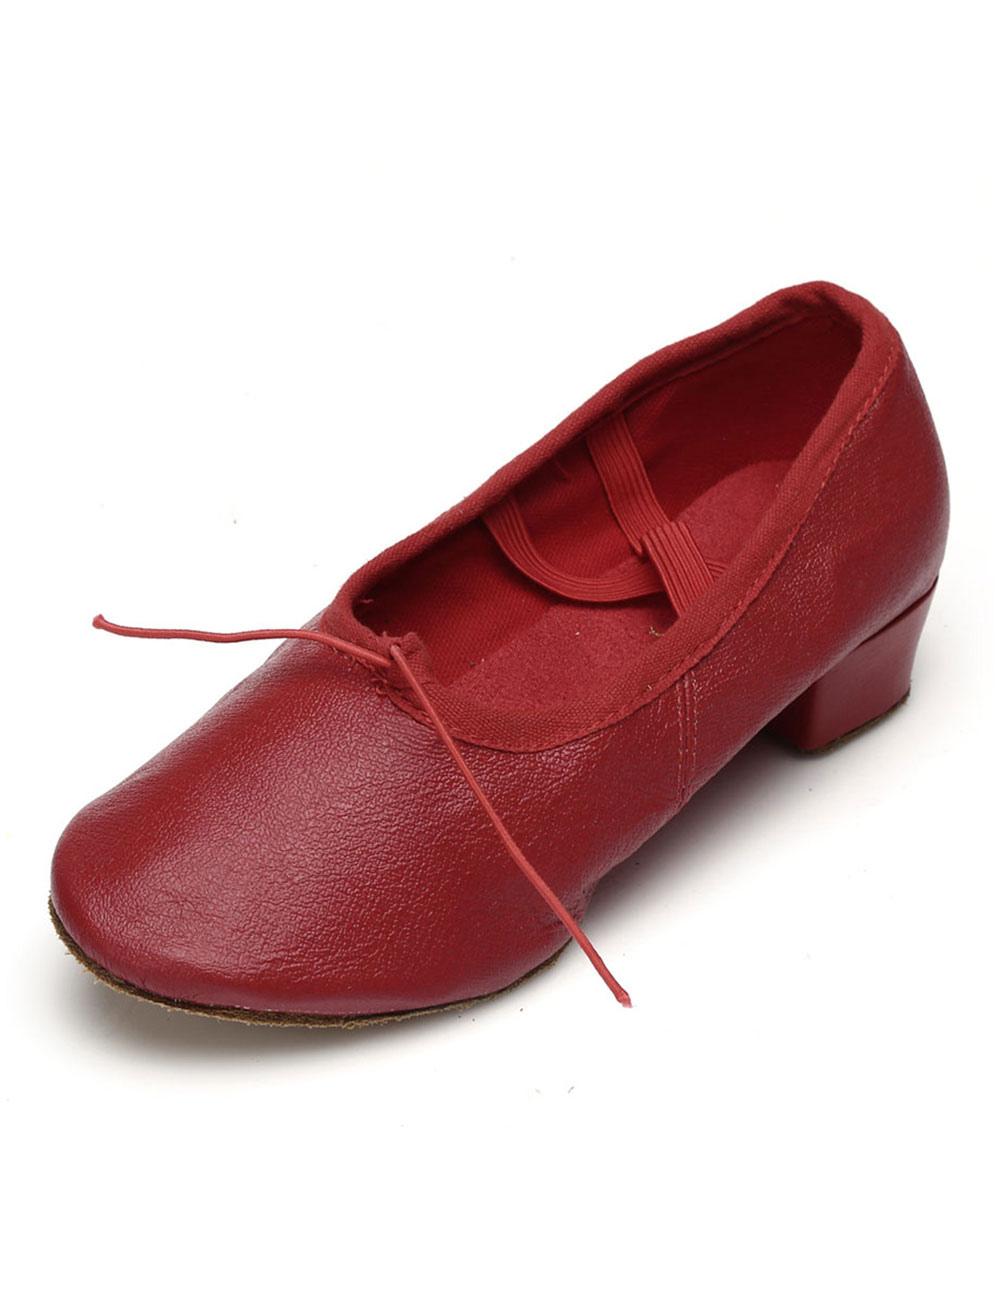 Ballet Dance Shoes Round Toe Criss Cross Dancing Shoes For Women